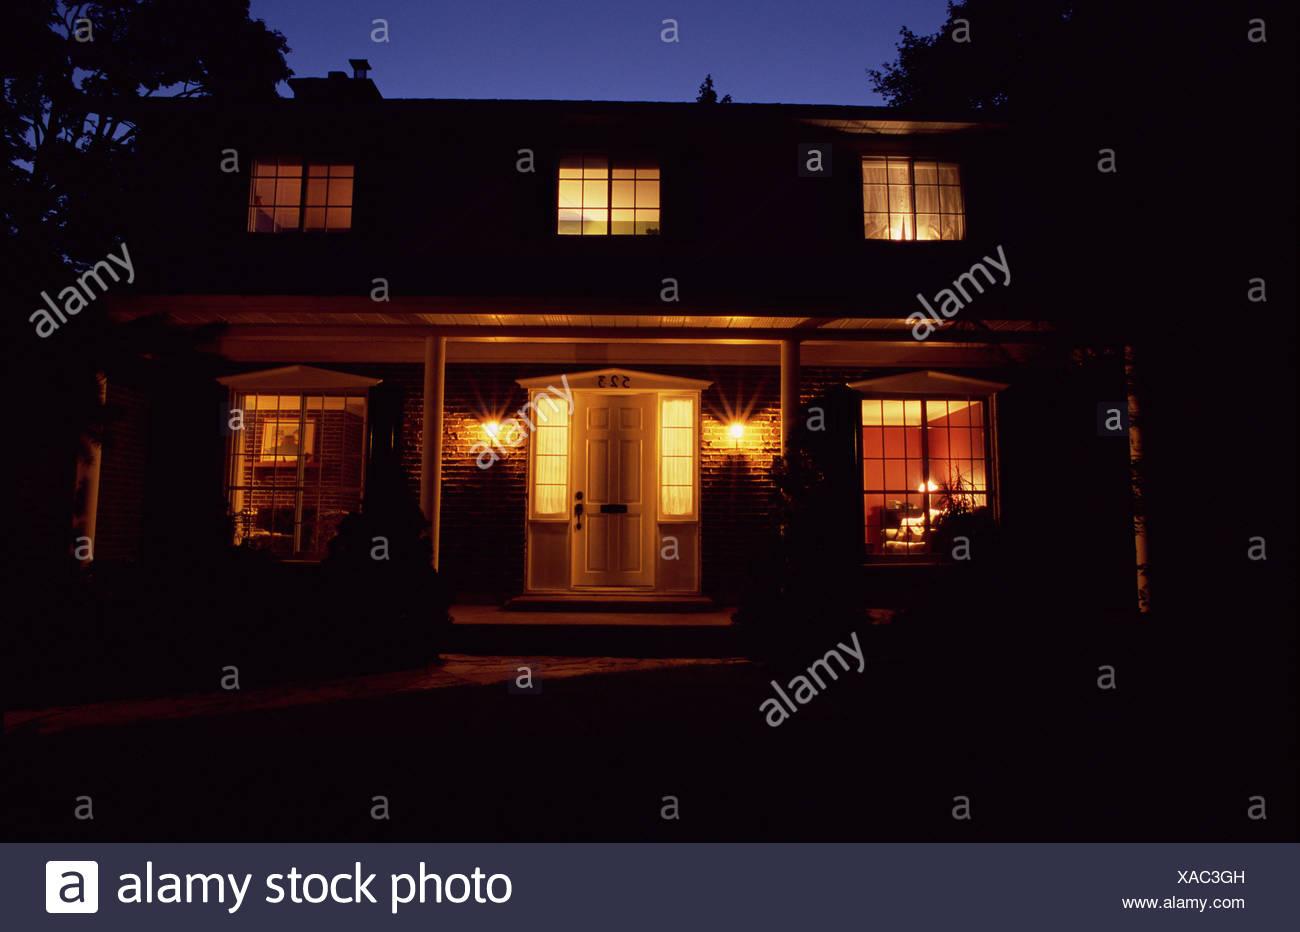 Luxus-Haus nachts beleuchtet Stockbild